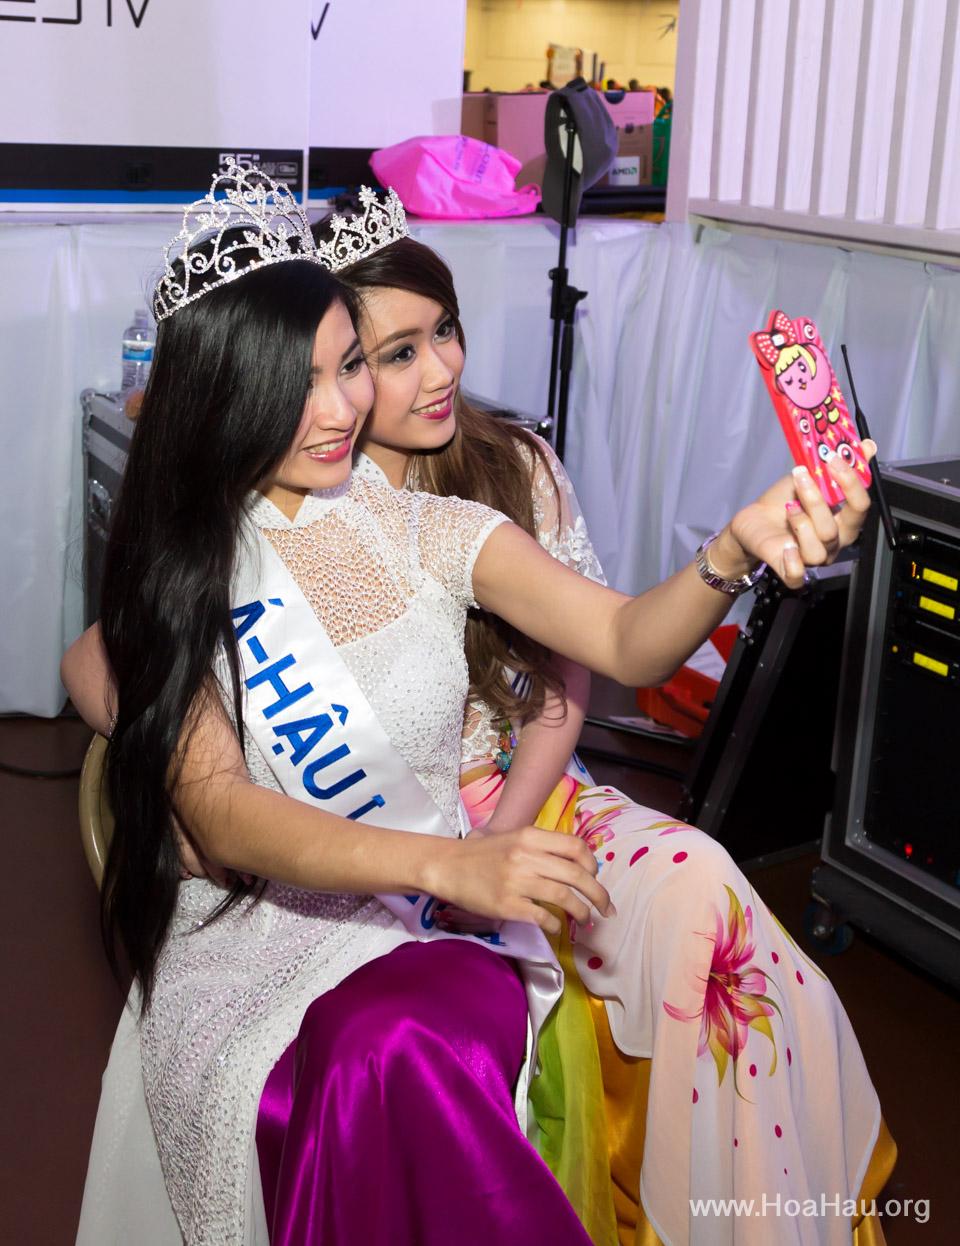 Tet Fairgrounds 2014 - Hoa Hậu Áo Dài Bắc Cali - Miss Vietnam of Northern California - Image 130